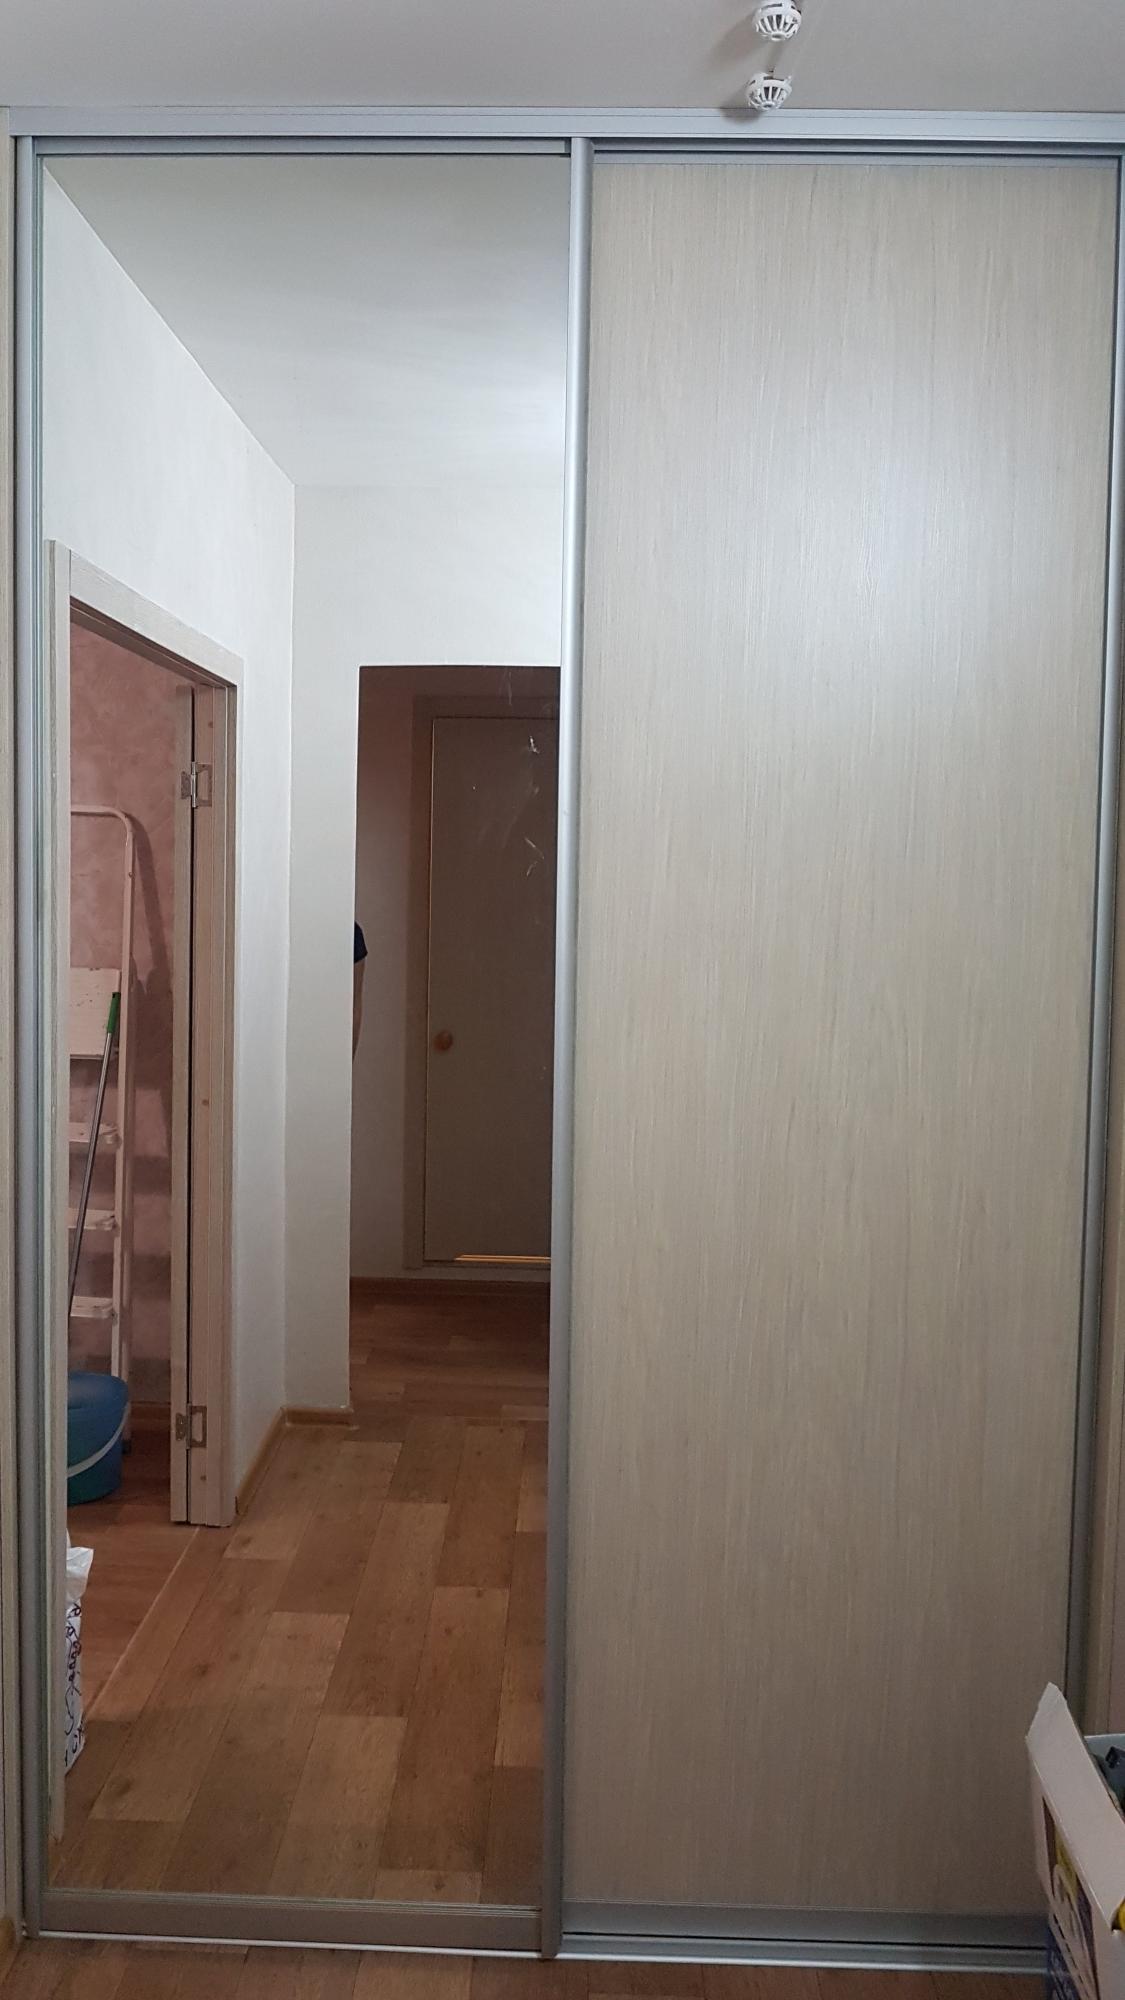 1к квартира улица Партизана Железняка, 61 | 20000 | аренда в Красноярске фото 11